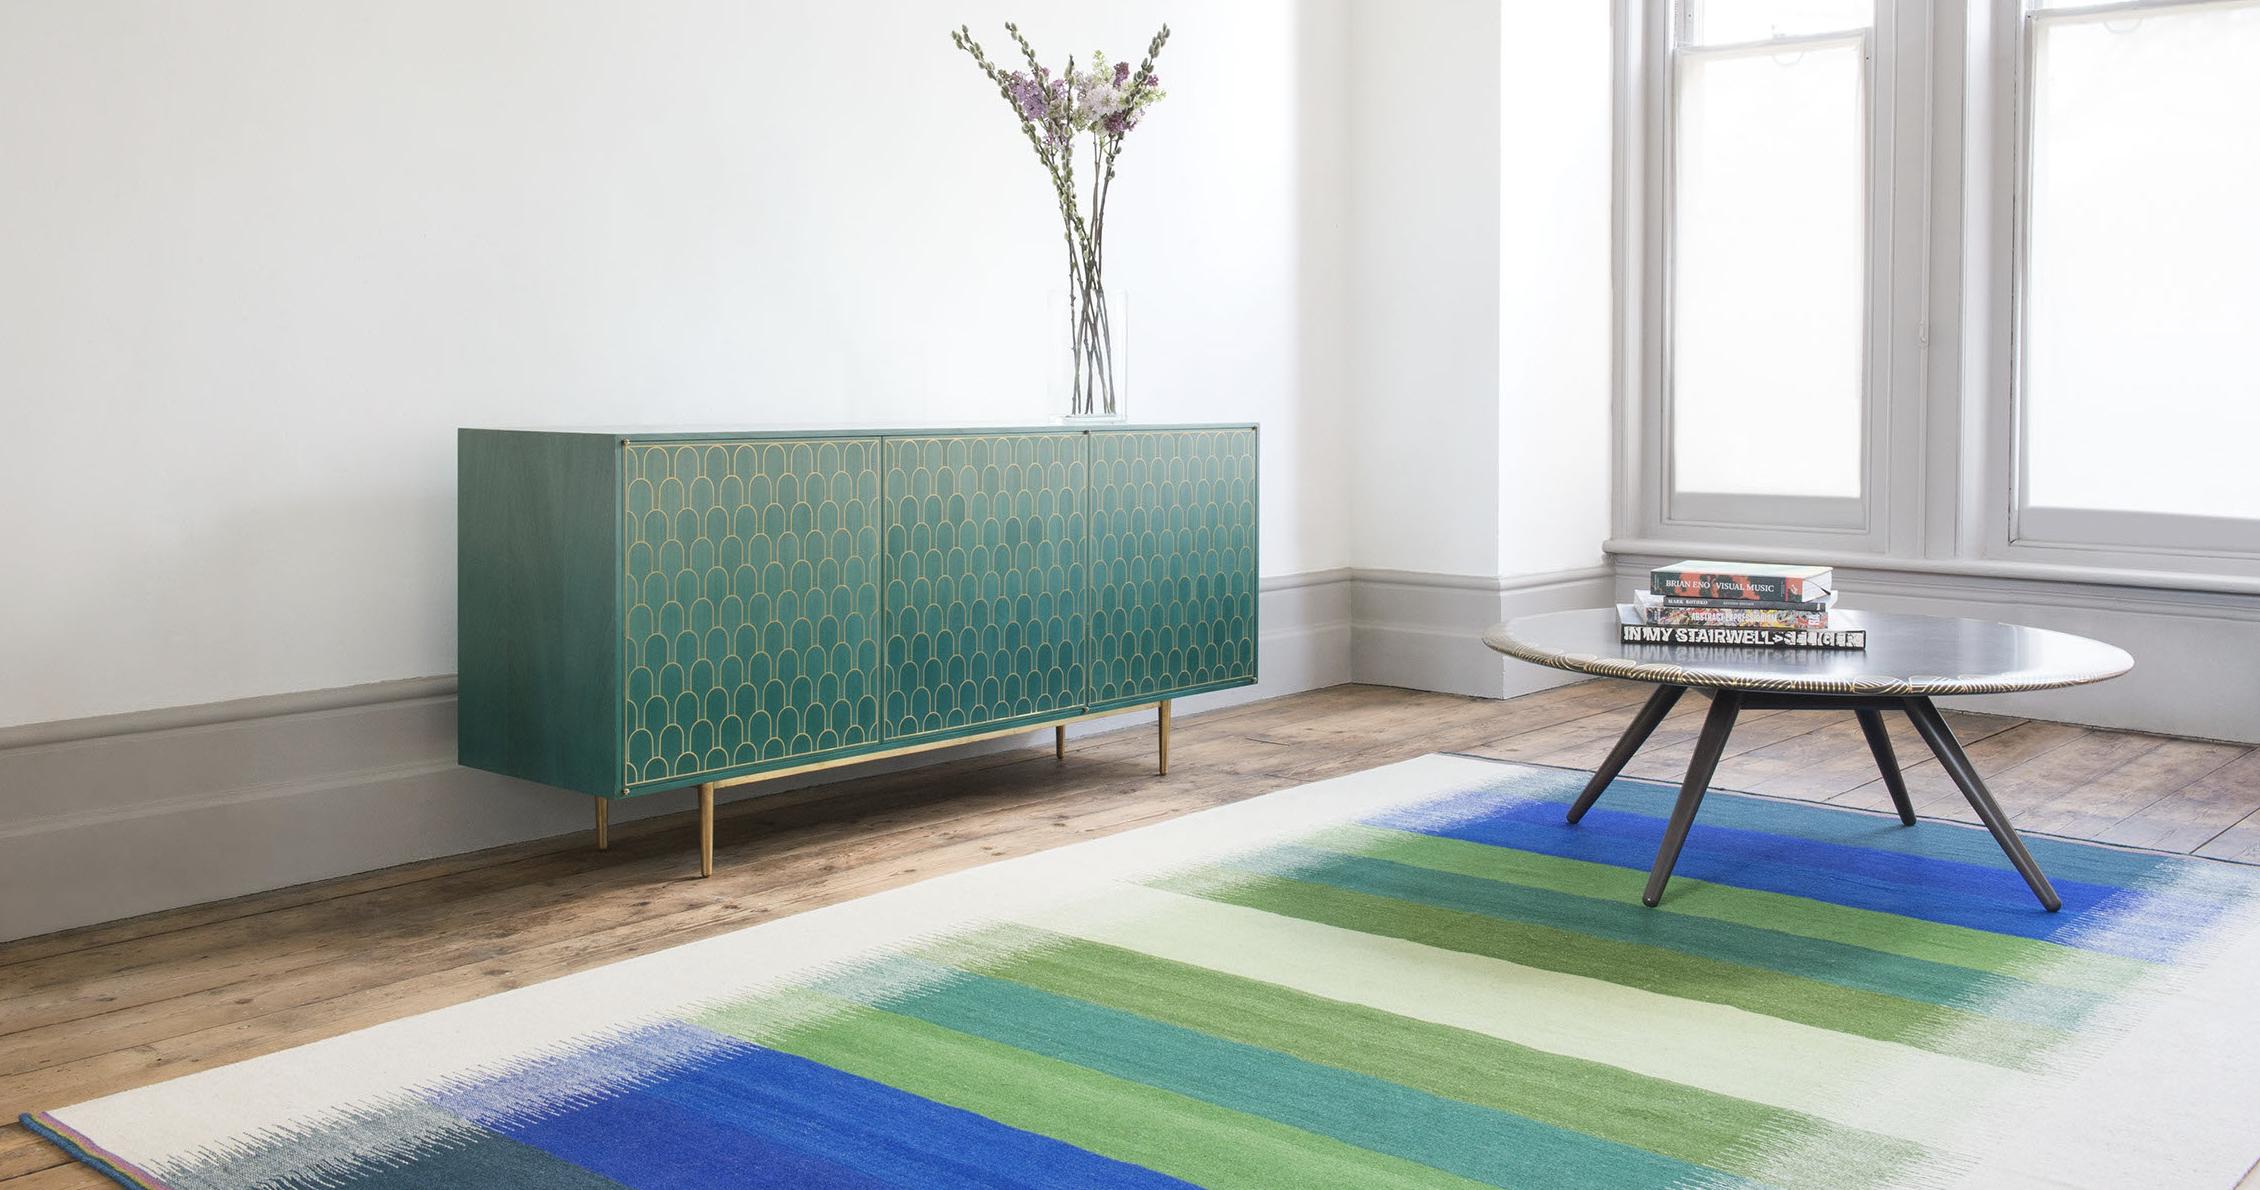 UK designer Ptolemy Mann specialises in flatweave rugs